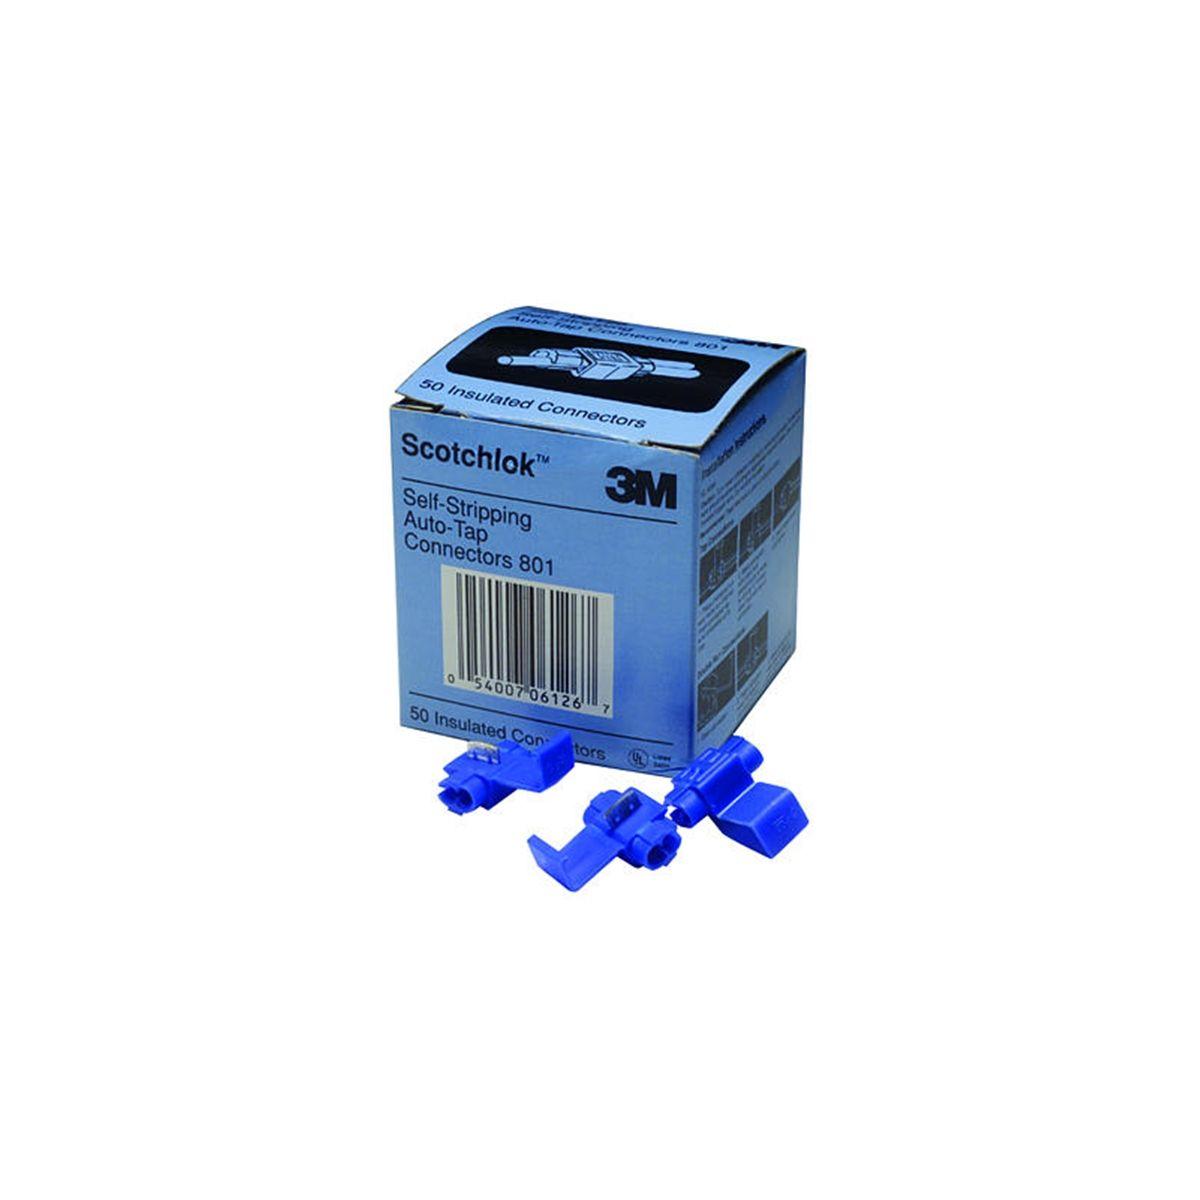 autotap fuse box wire scotchlok electrical insulation displacement connector 801 3m  scotchlok electrical insulation